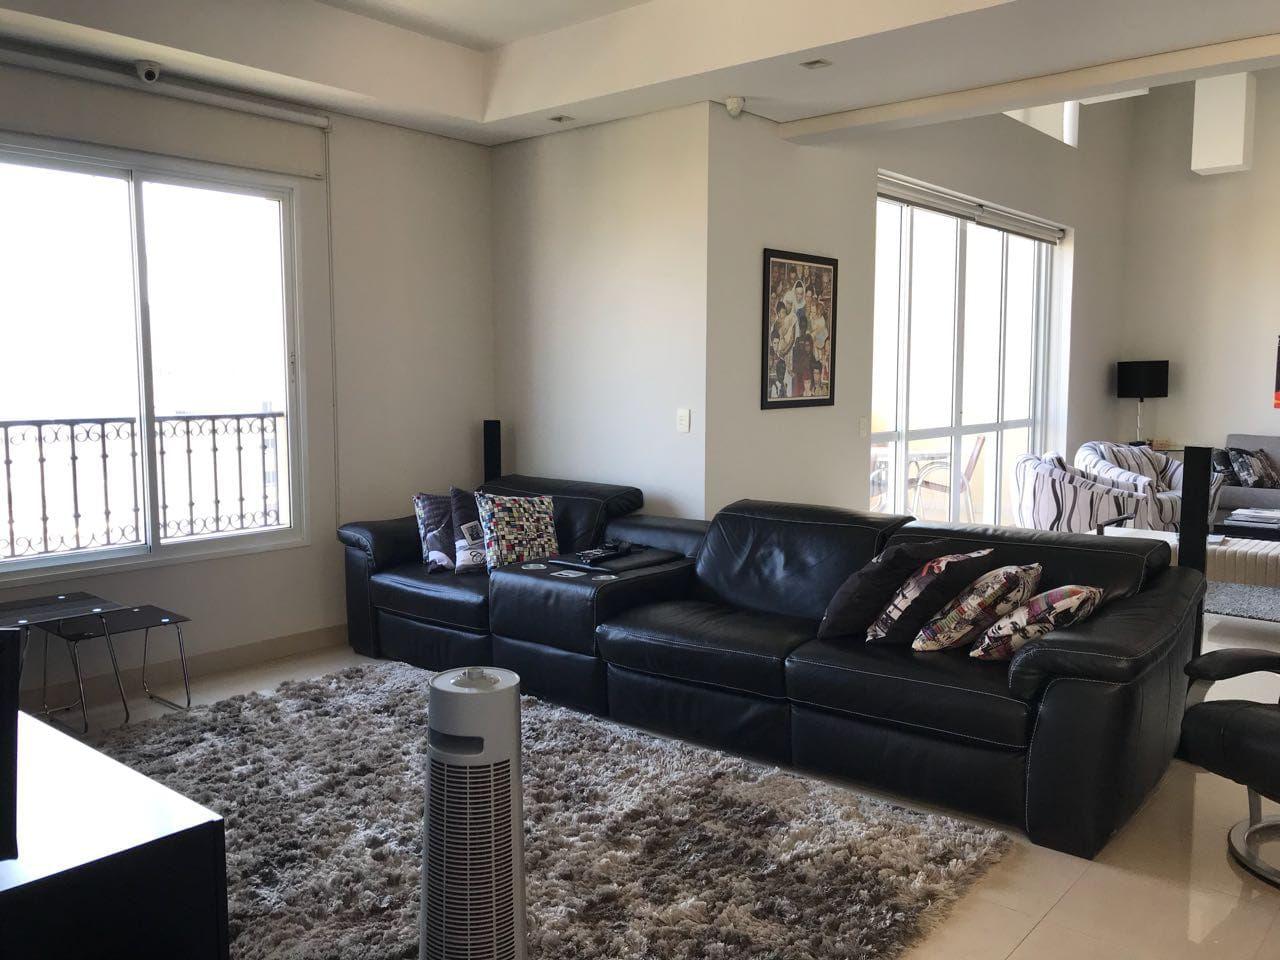 627 - Cobertura Alta  Fiusa 4 dormitórios - 352m²